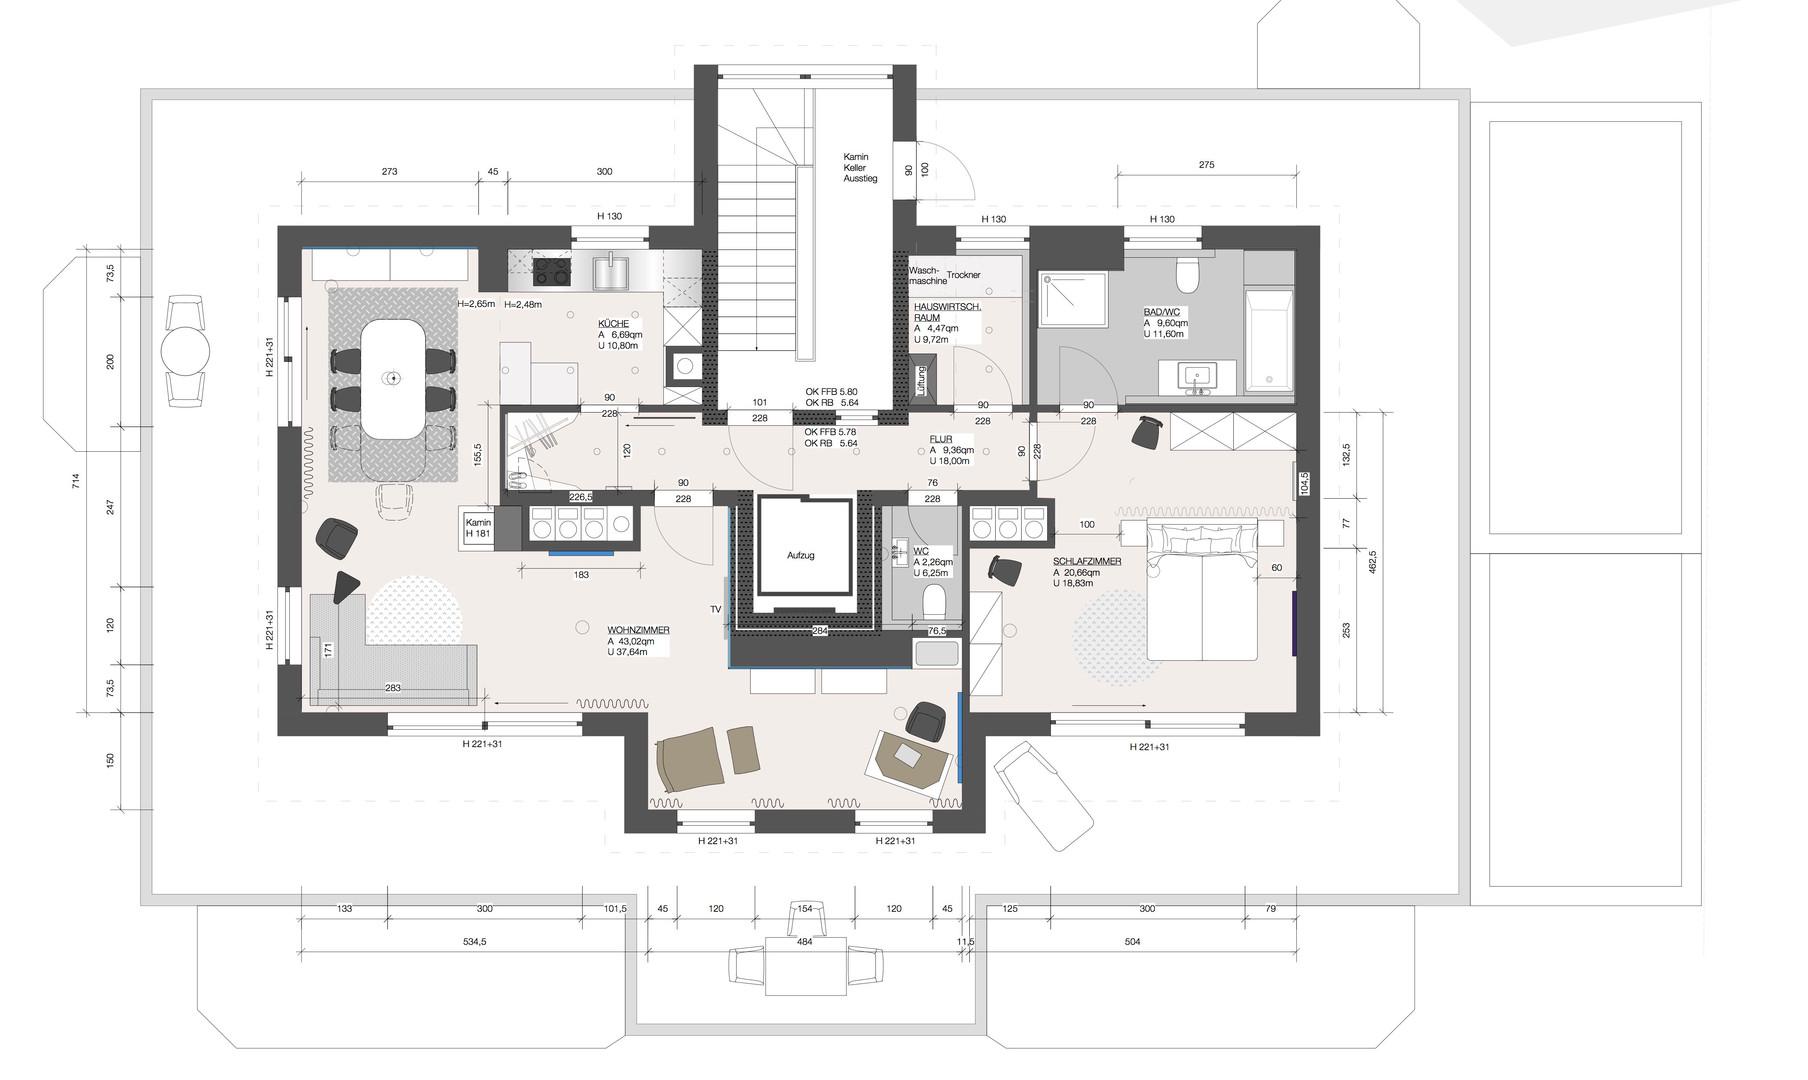 Penthouse_Grundriss.jpg